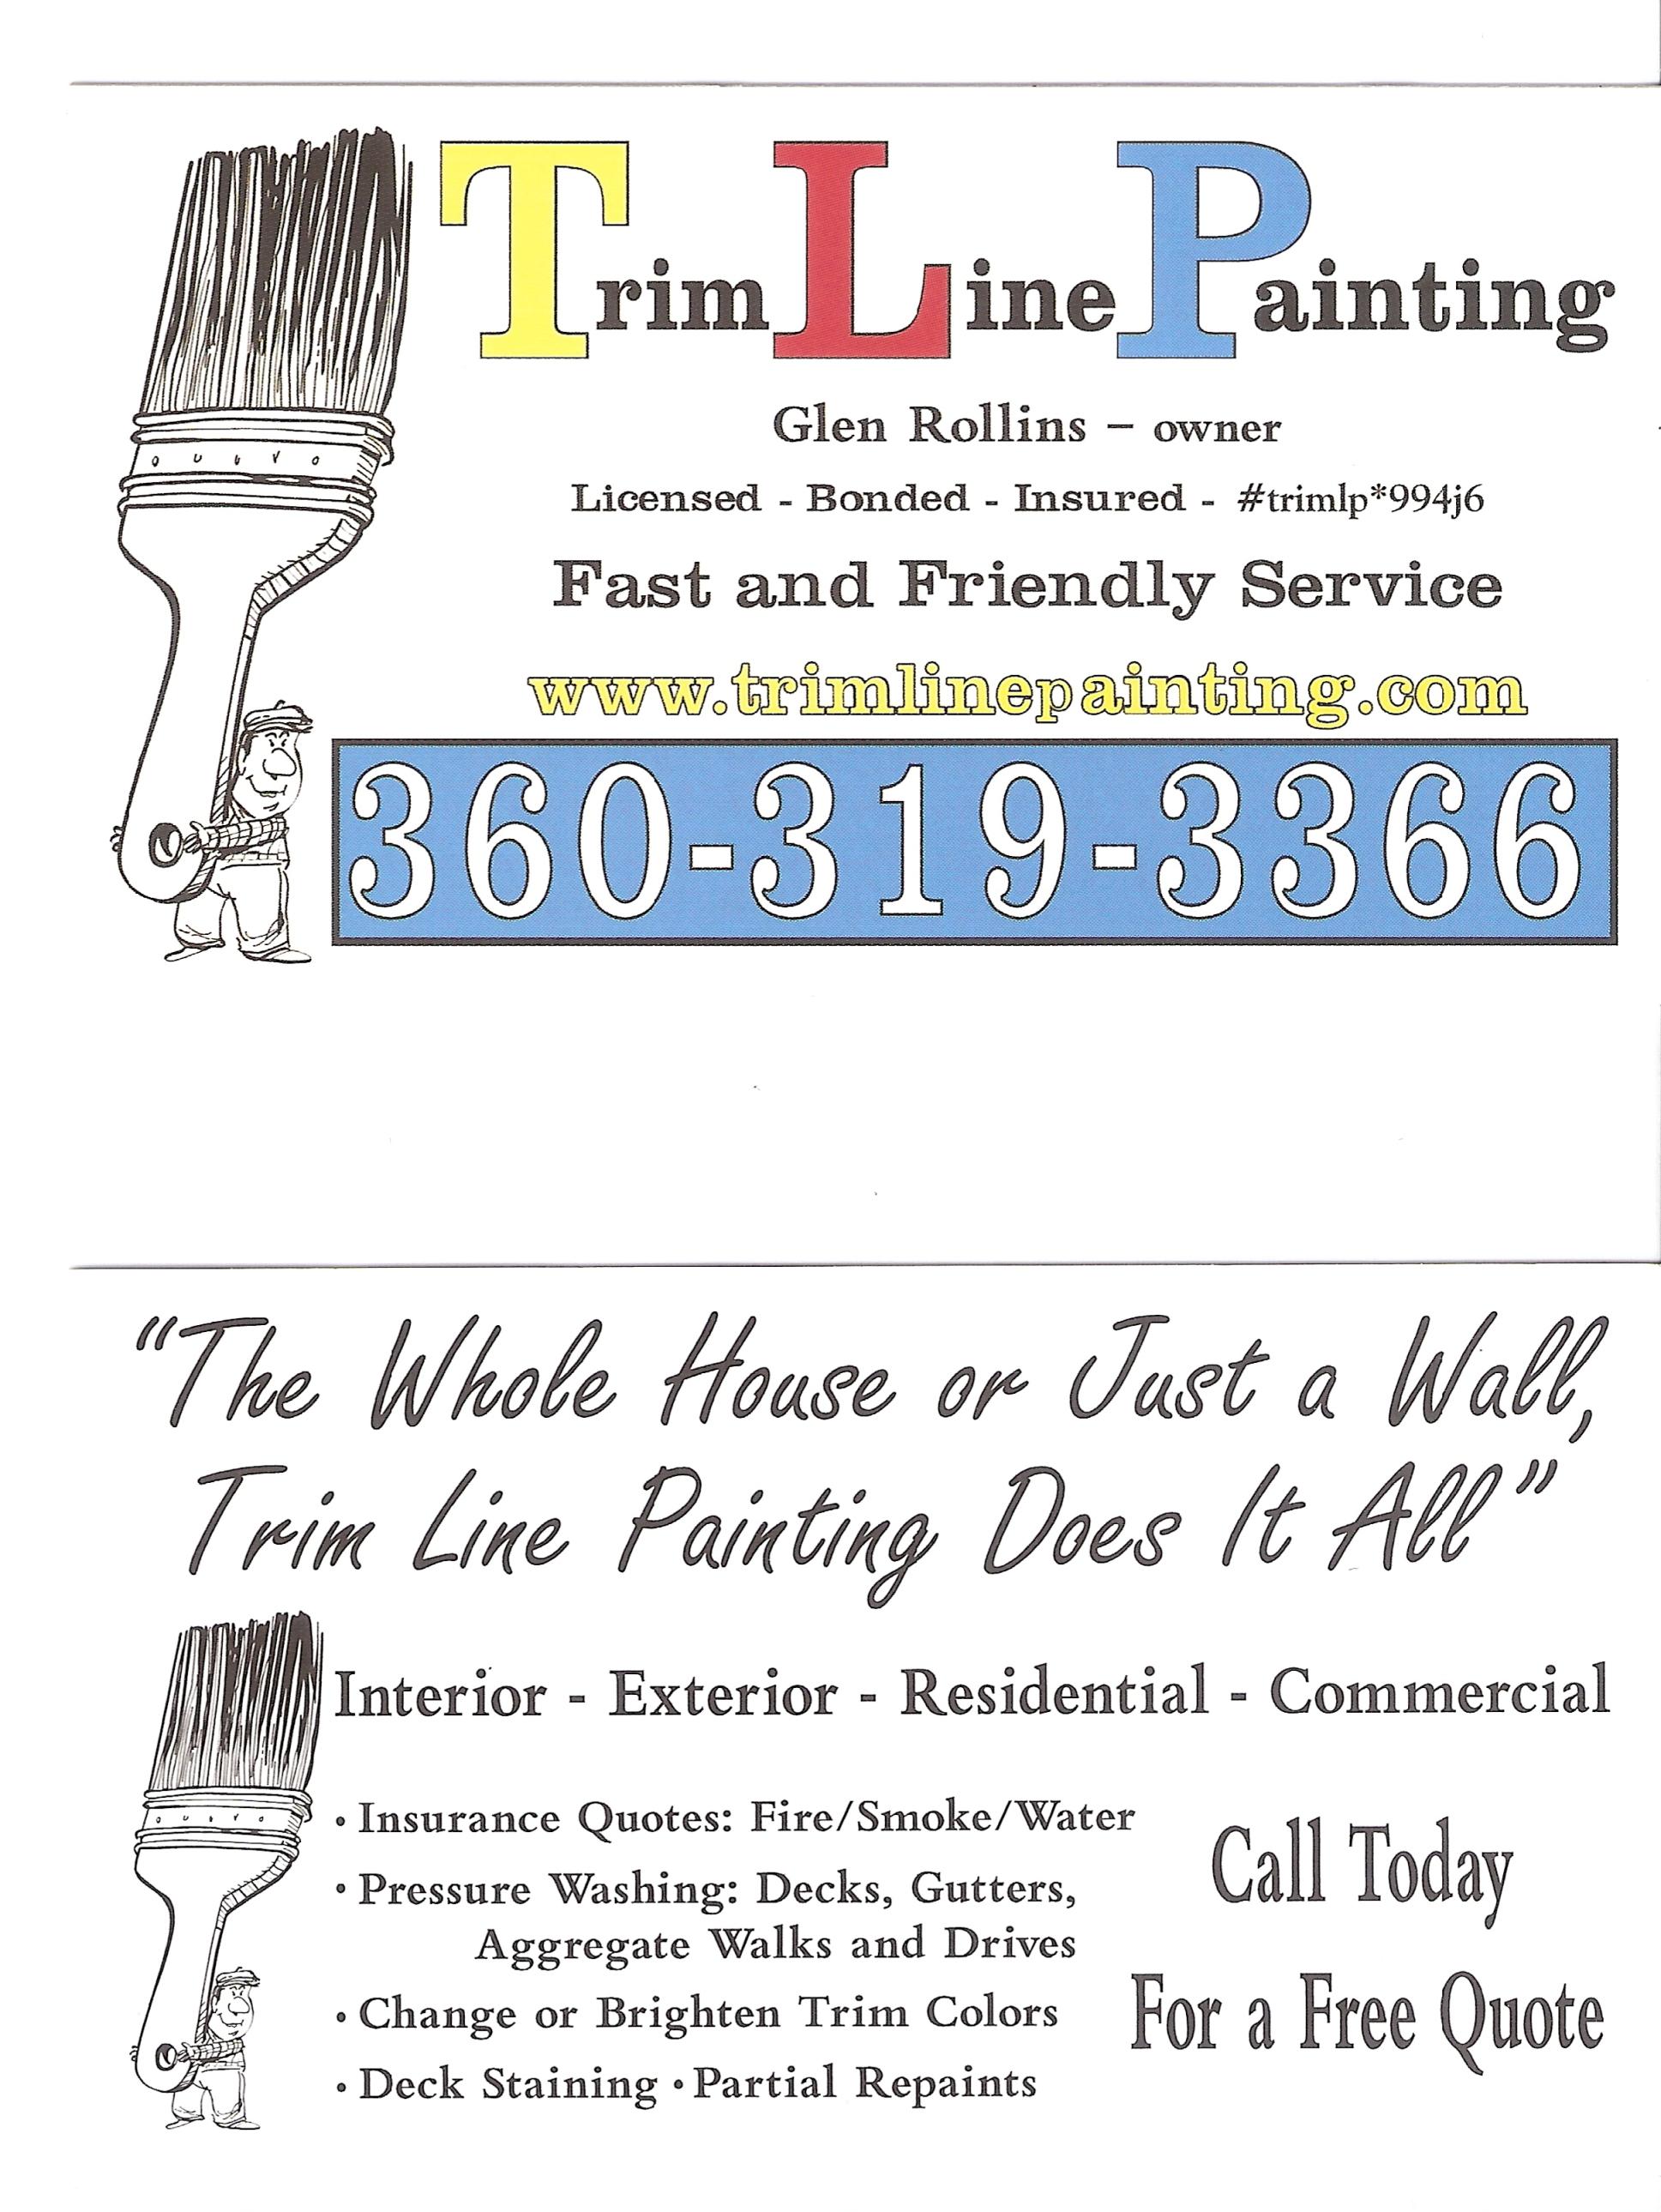 Trim Line Painting logo